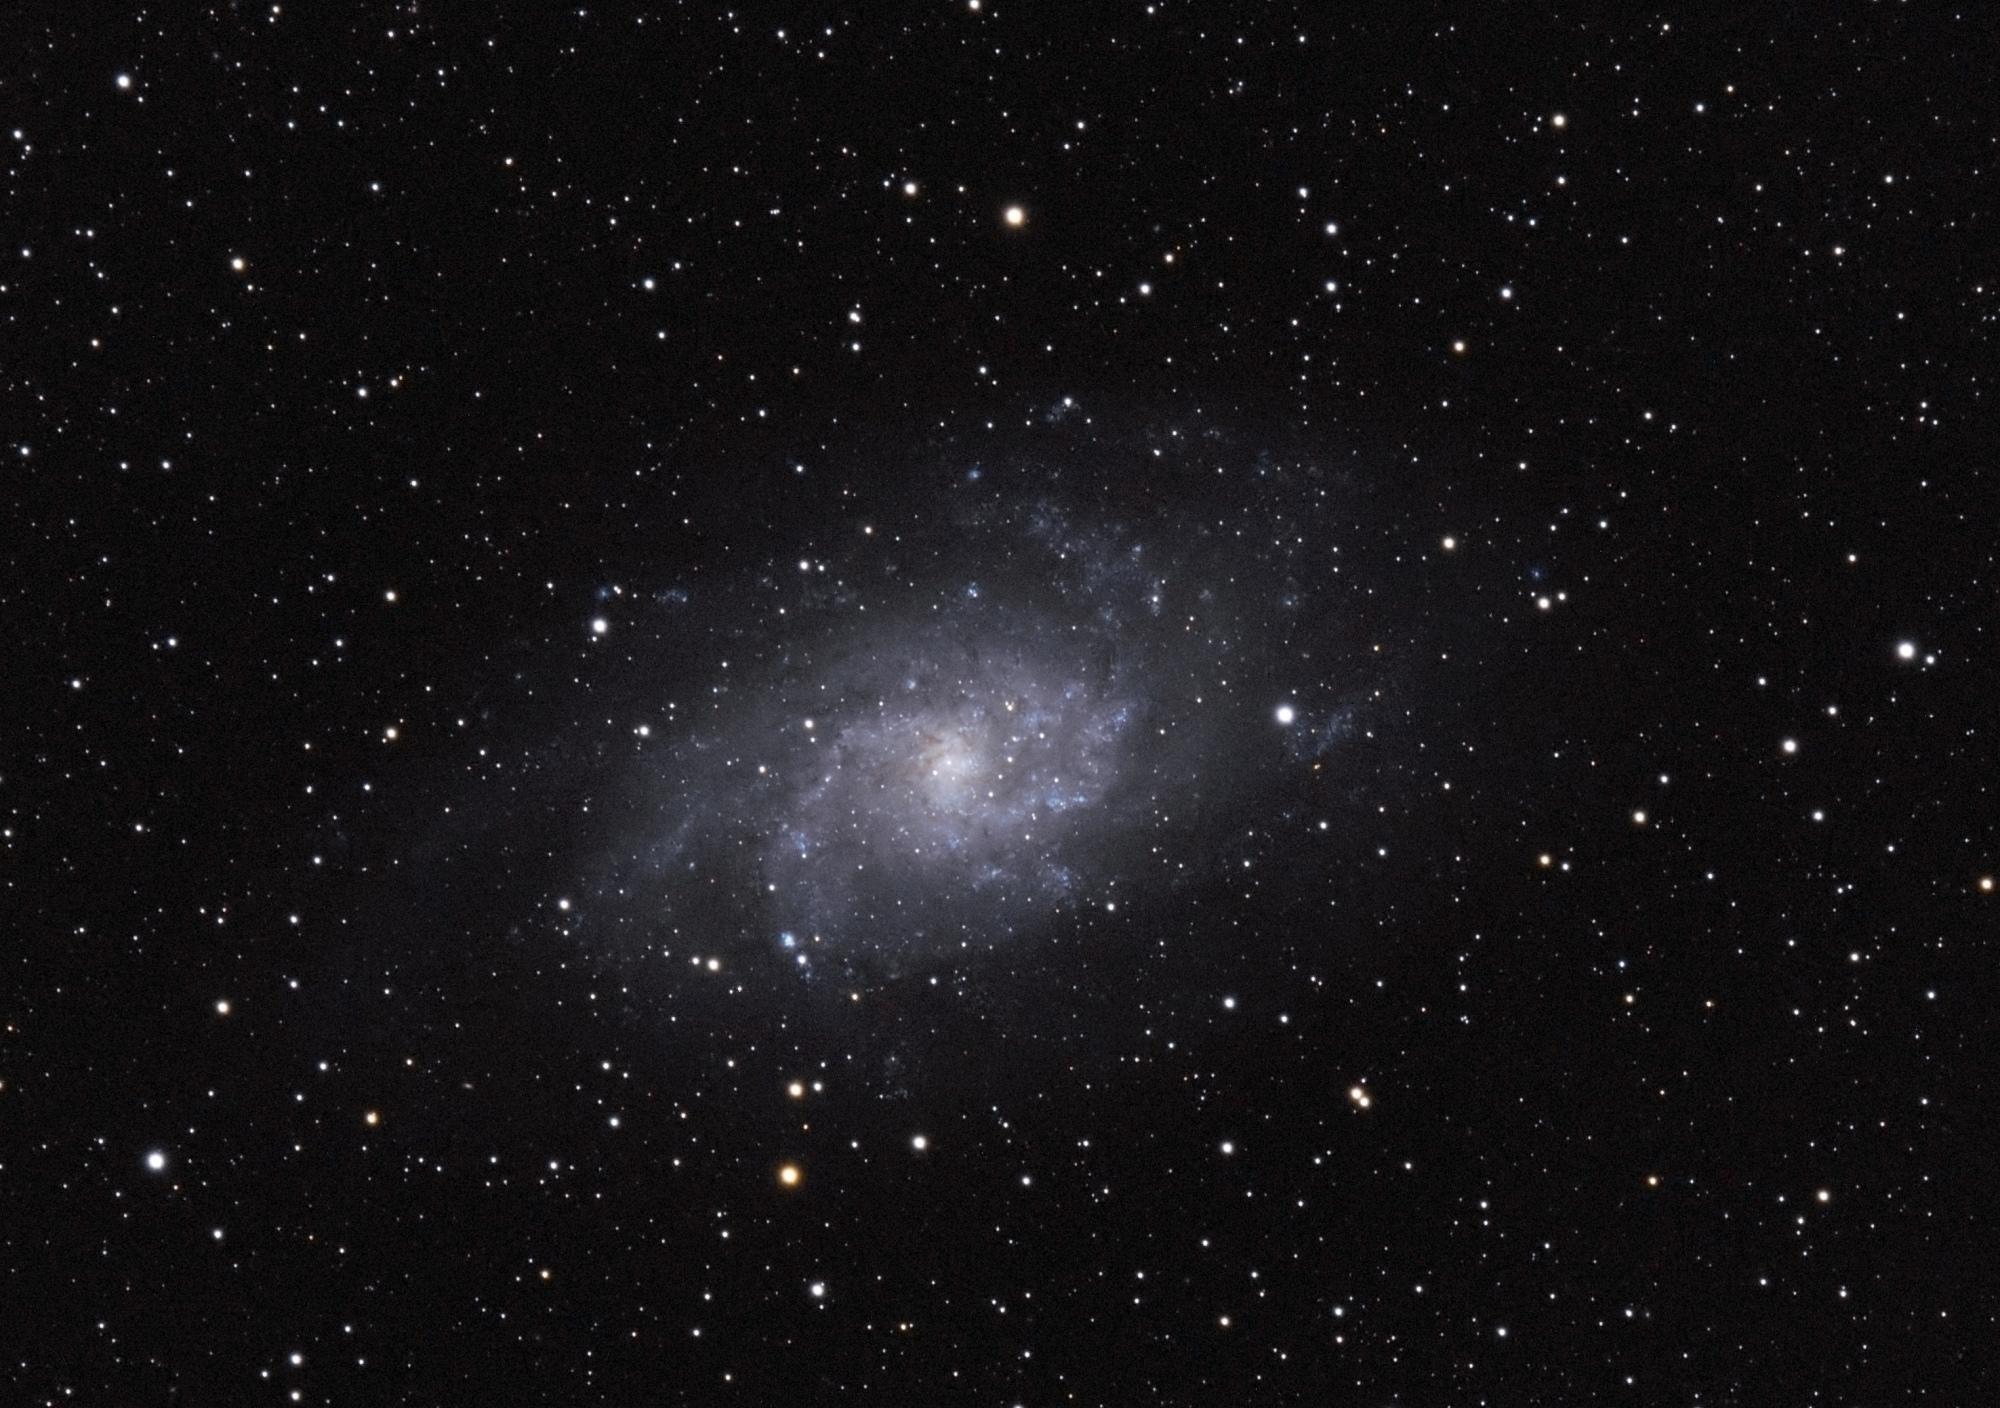 M33_SIRIL_ref2.jpg.8f405a858fbbe31ea7eac0b227ba04a9.jpg